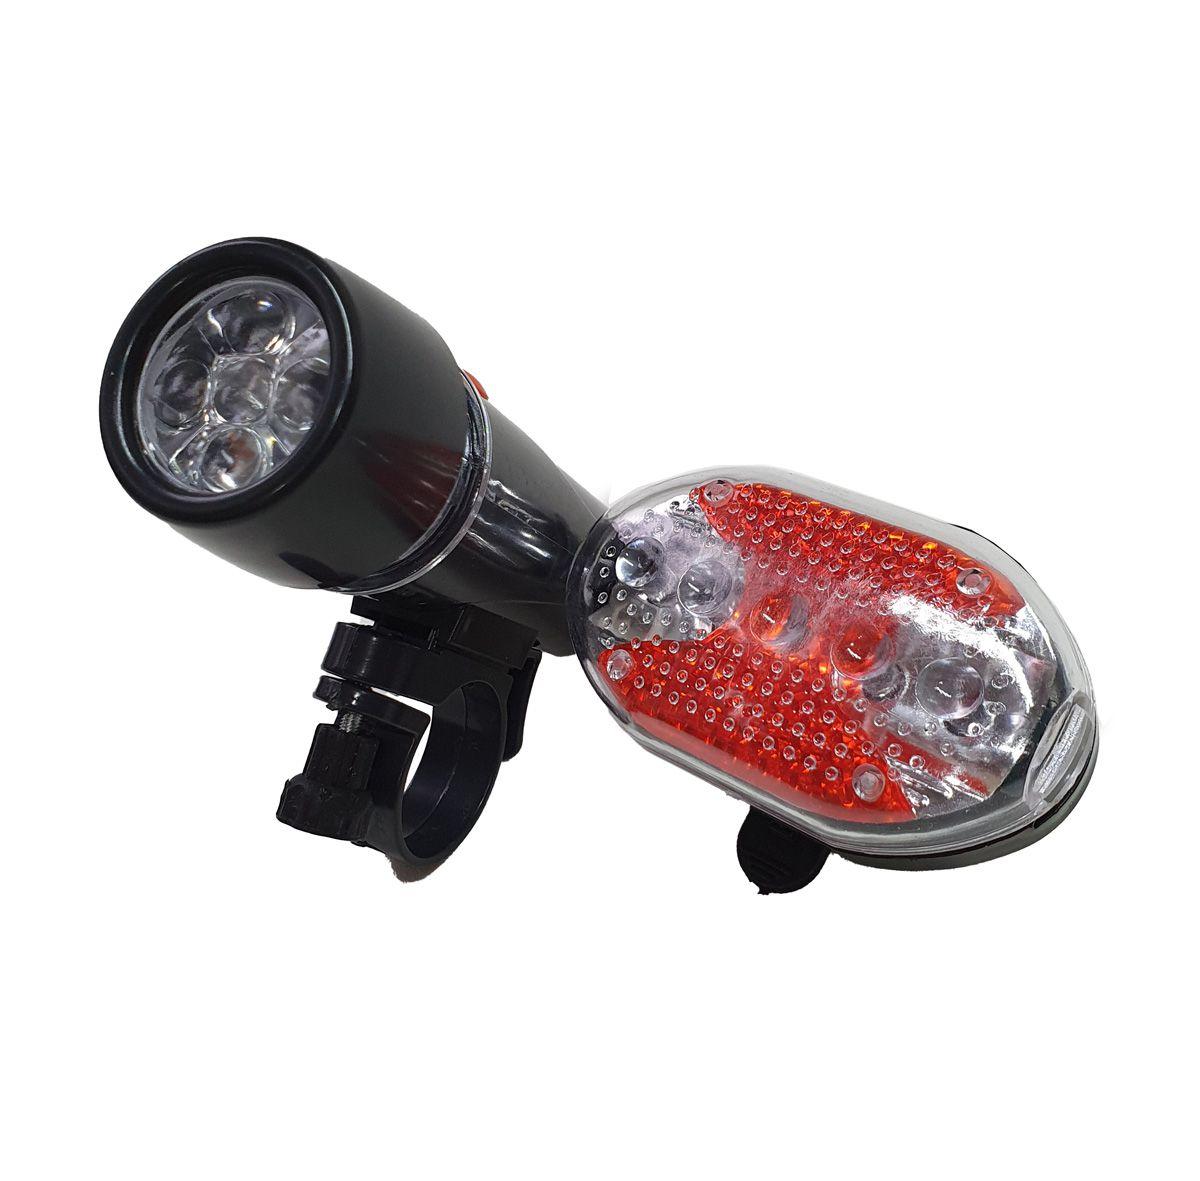 Kit Farol E Lanterna Luz Traseira Bike Luatek